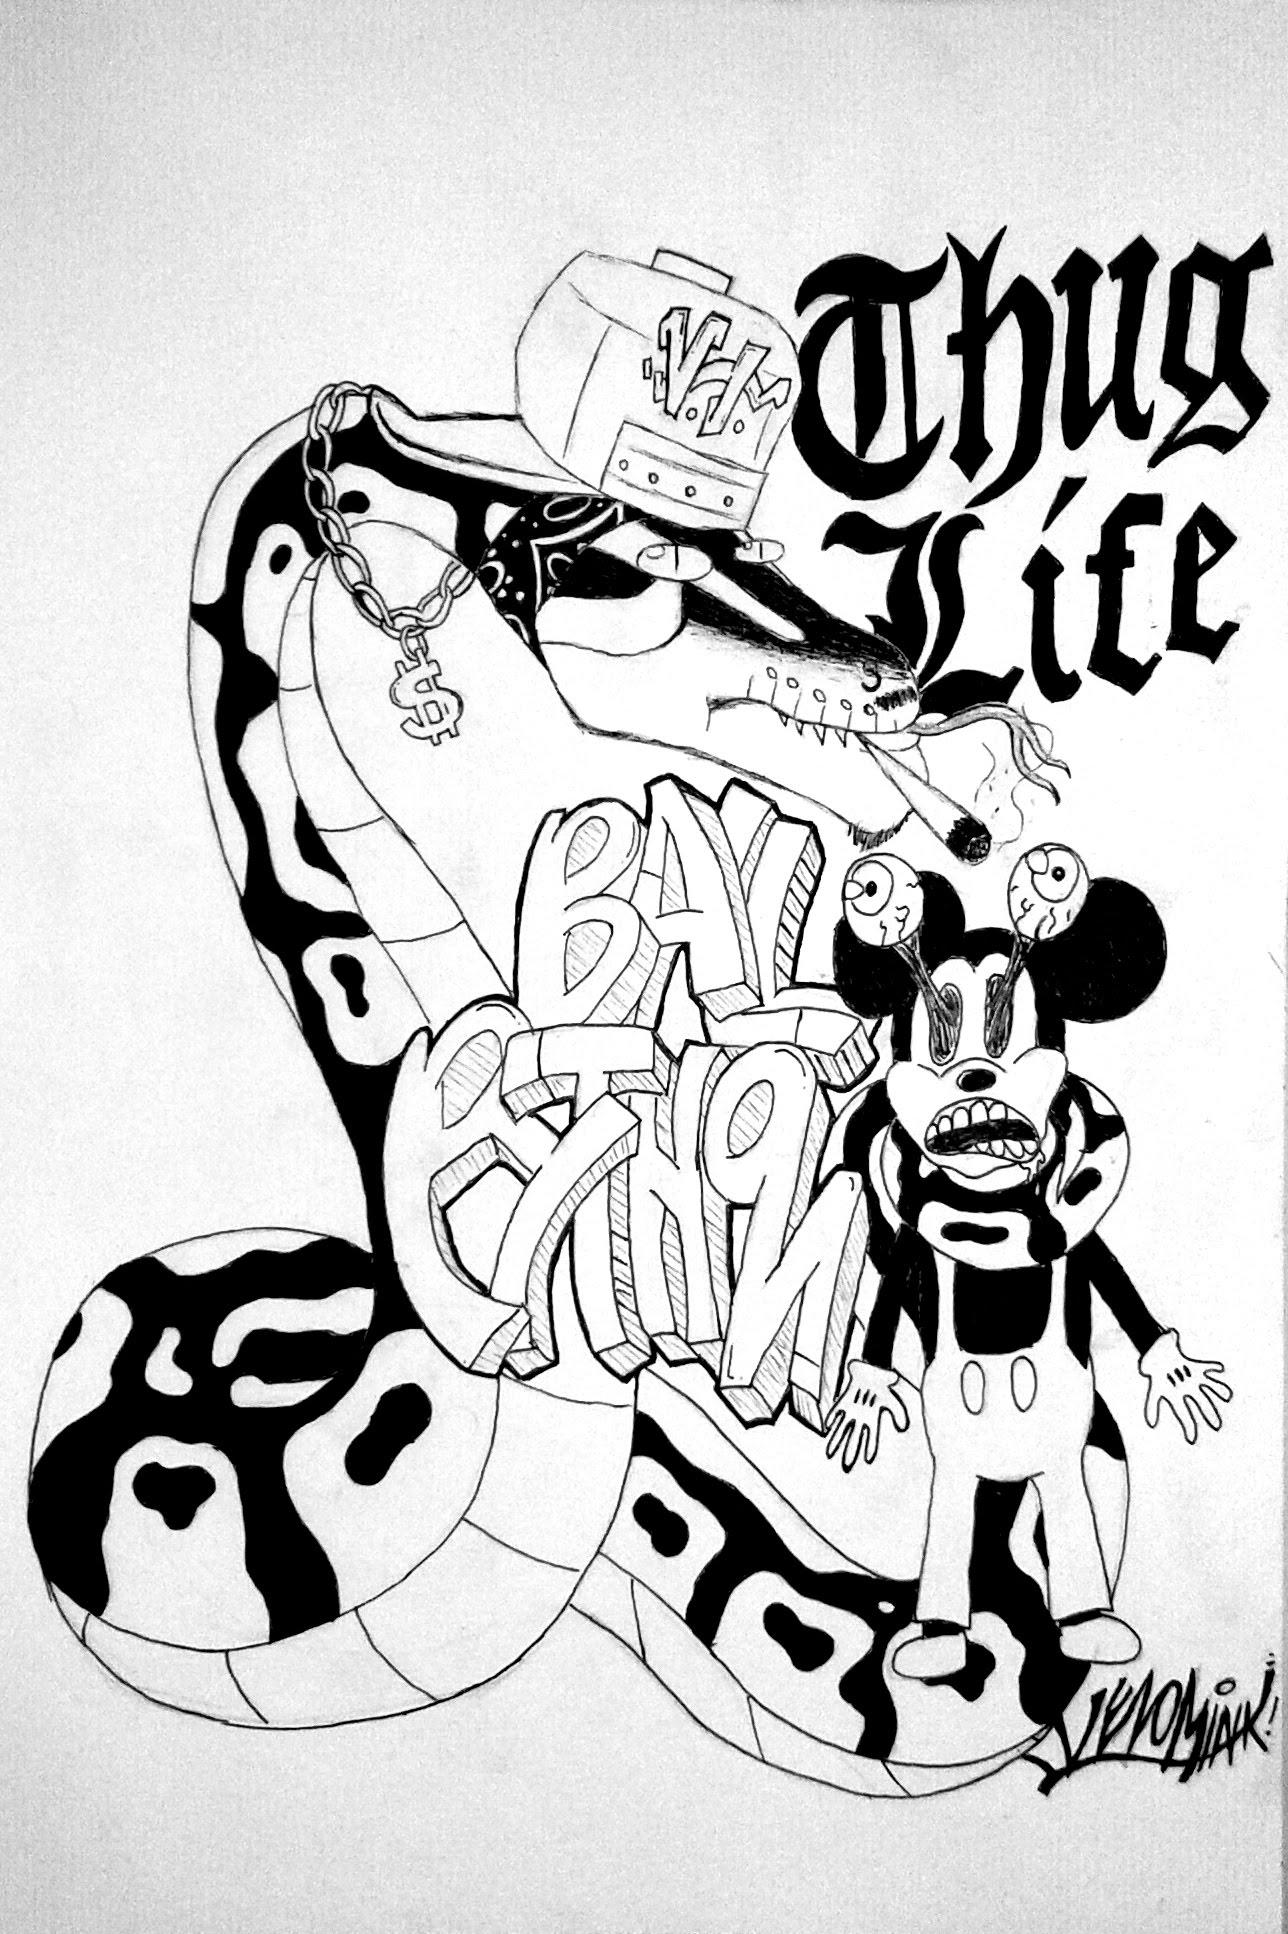 1288x1934 Thug Life Ball Python Graffiti Style Speed Drawing